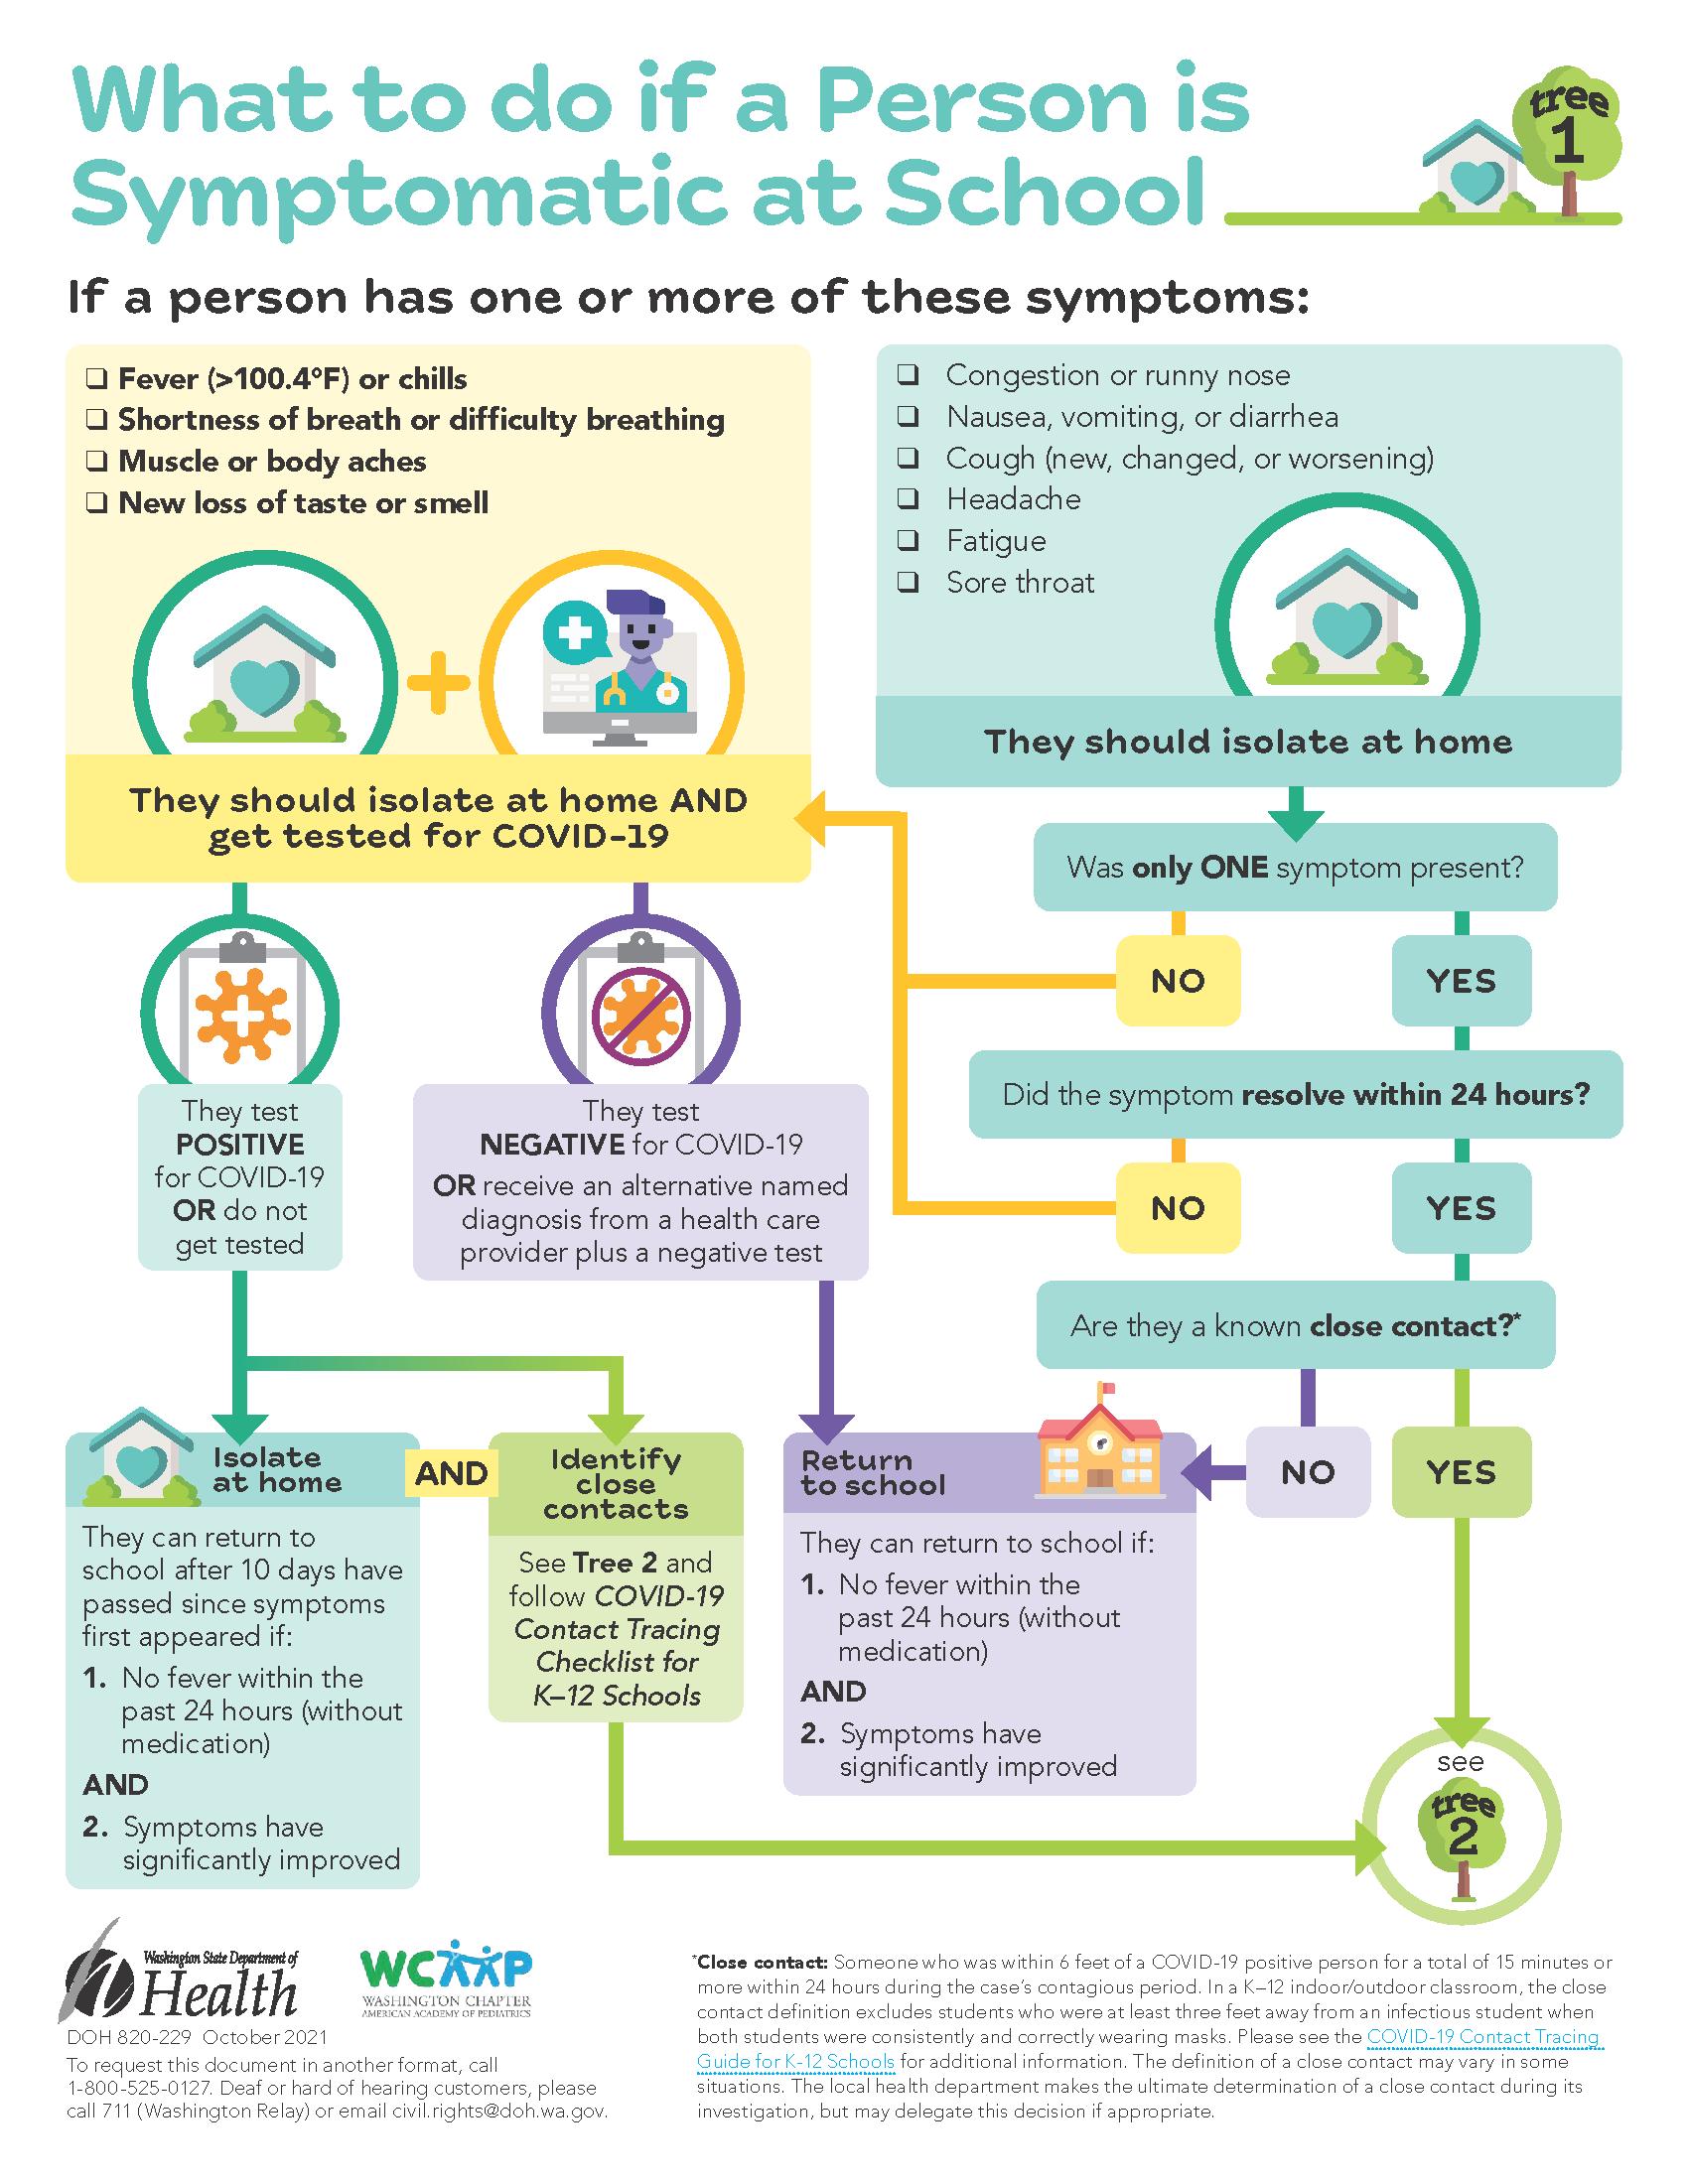 symptomatic at school flow chart